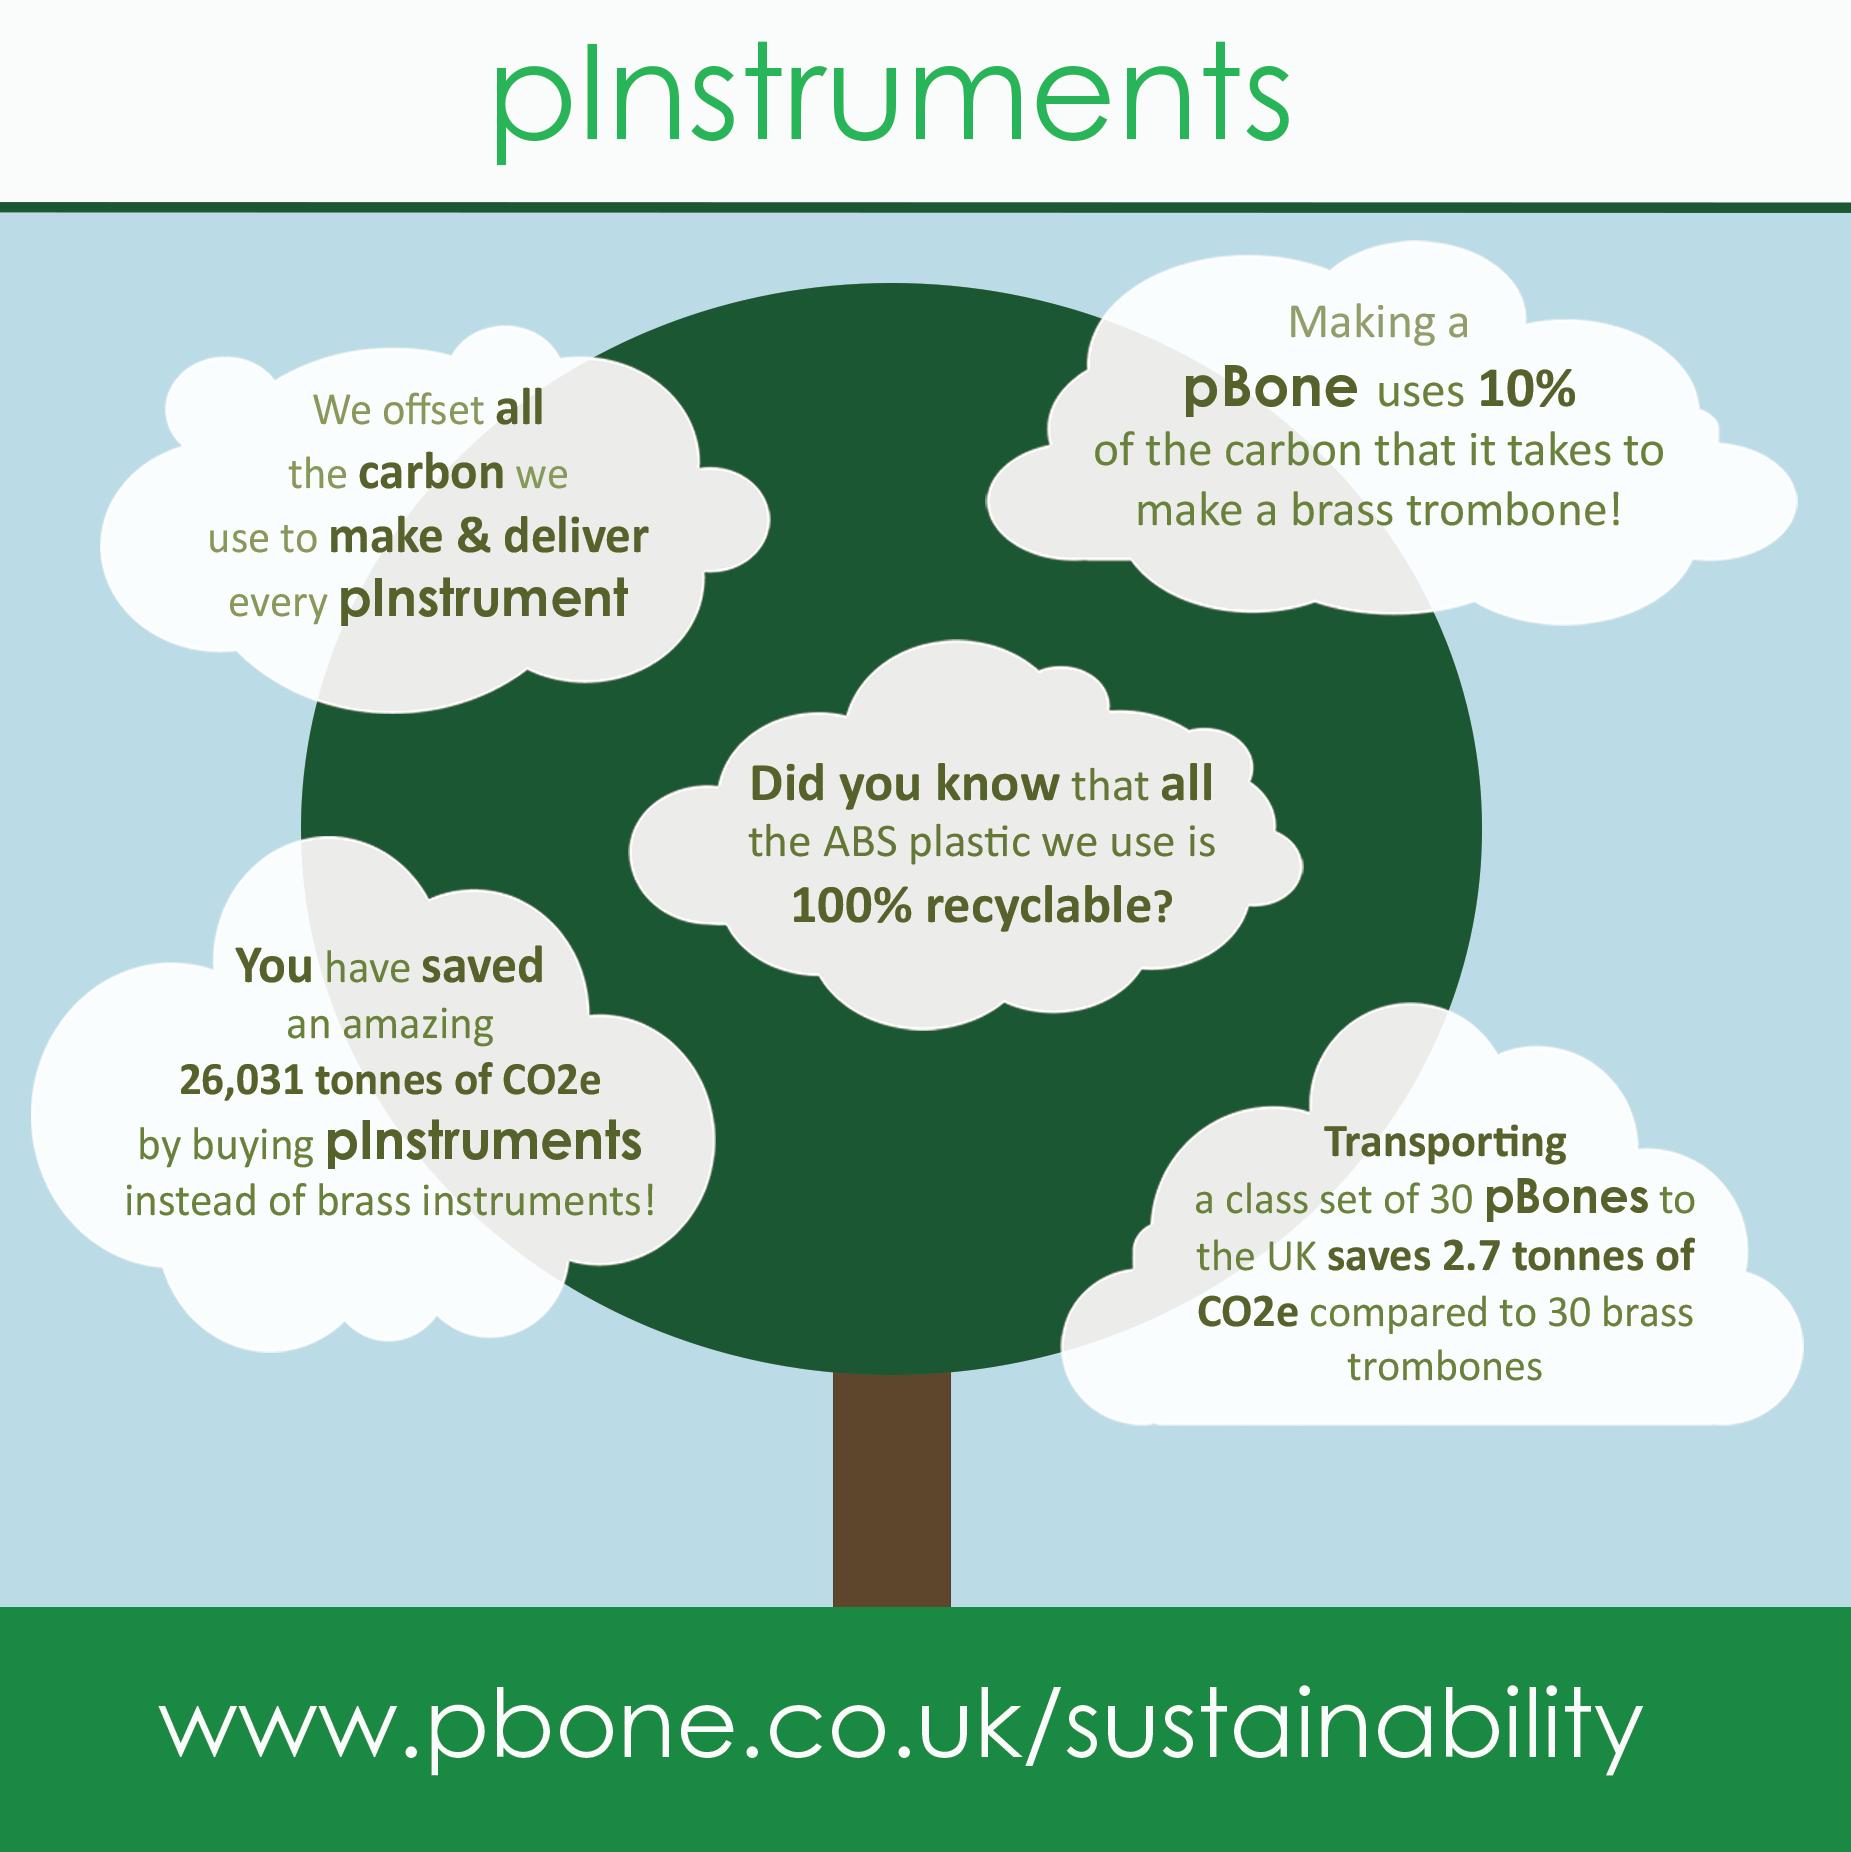 plastic-brass-comparison-sustainabiity